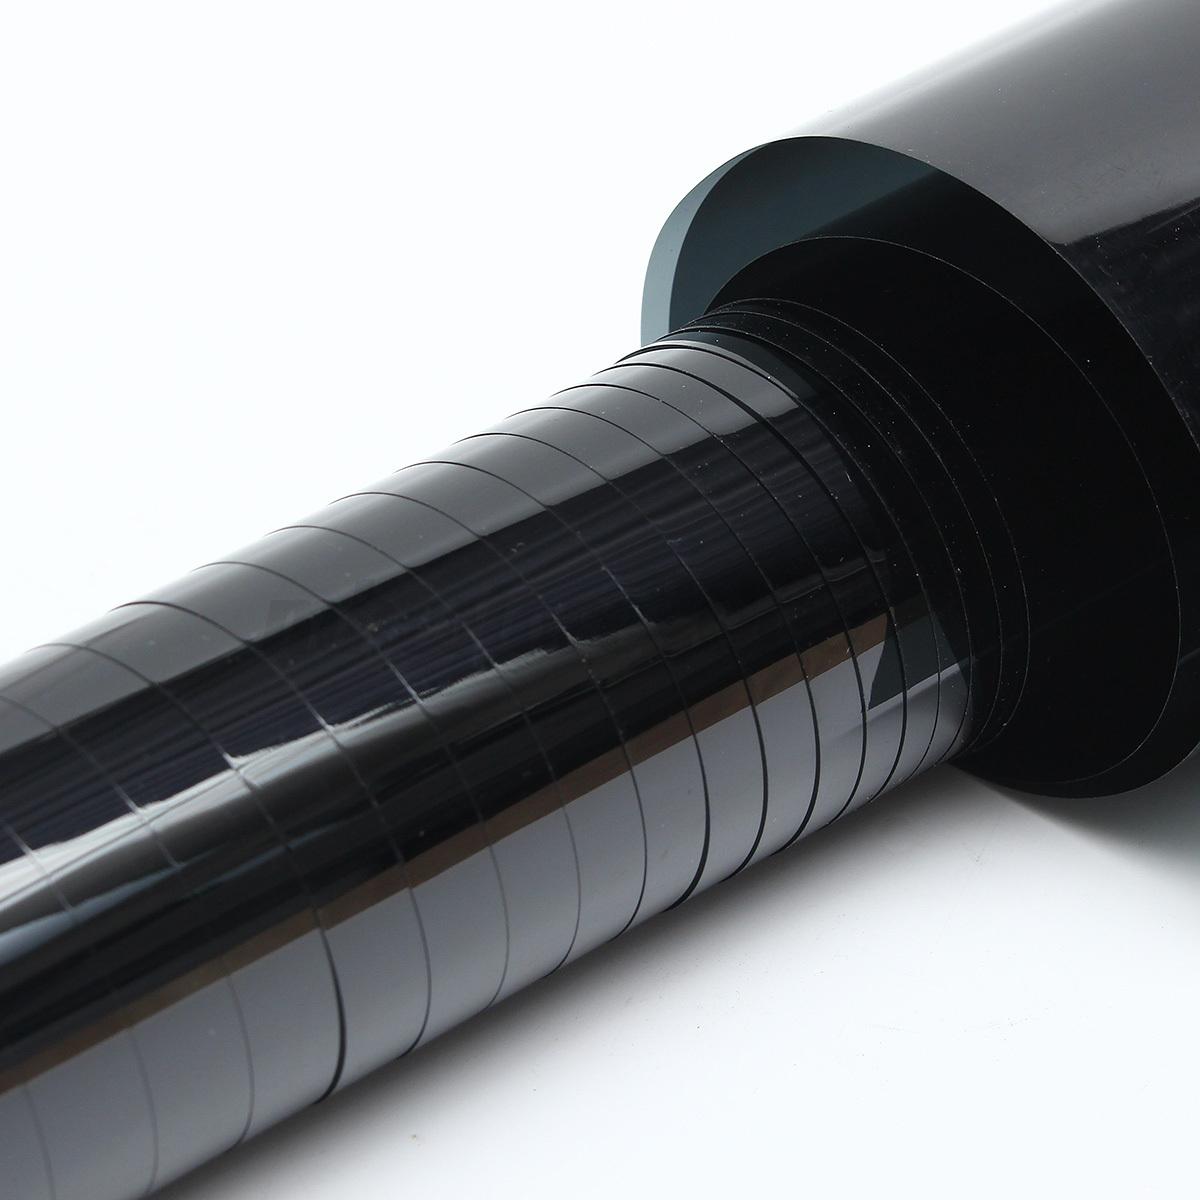 3 0 5m roll window tint film 30 vlt 20 in x 10 39 ft feet for 0 window tint